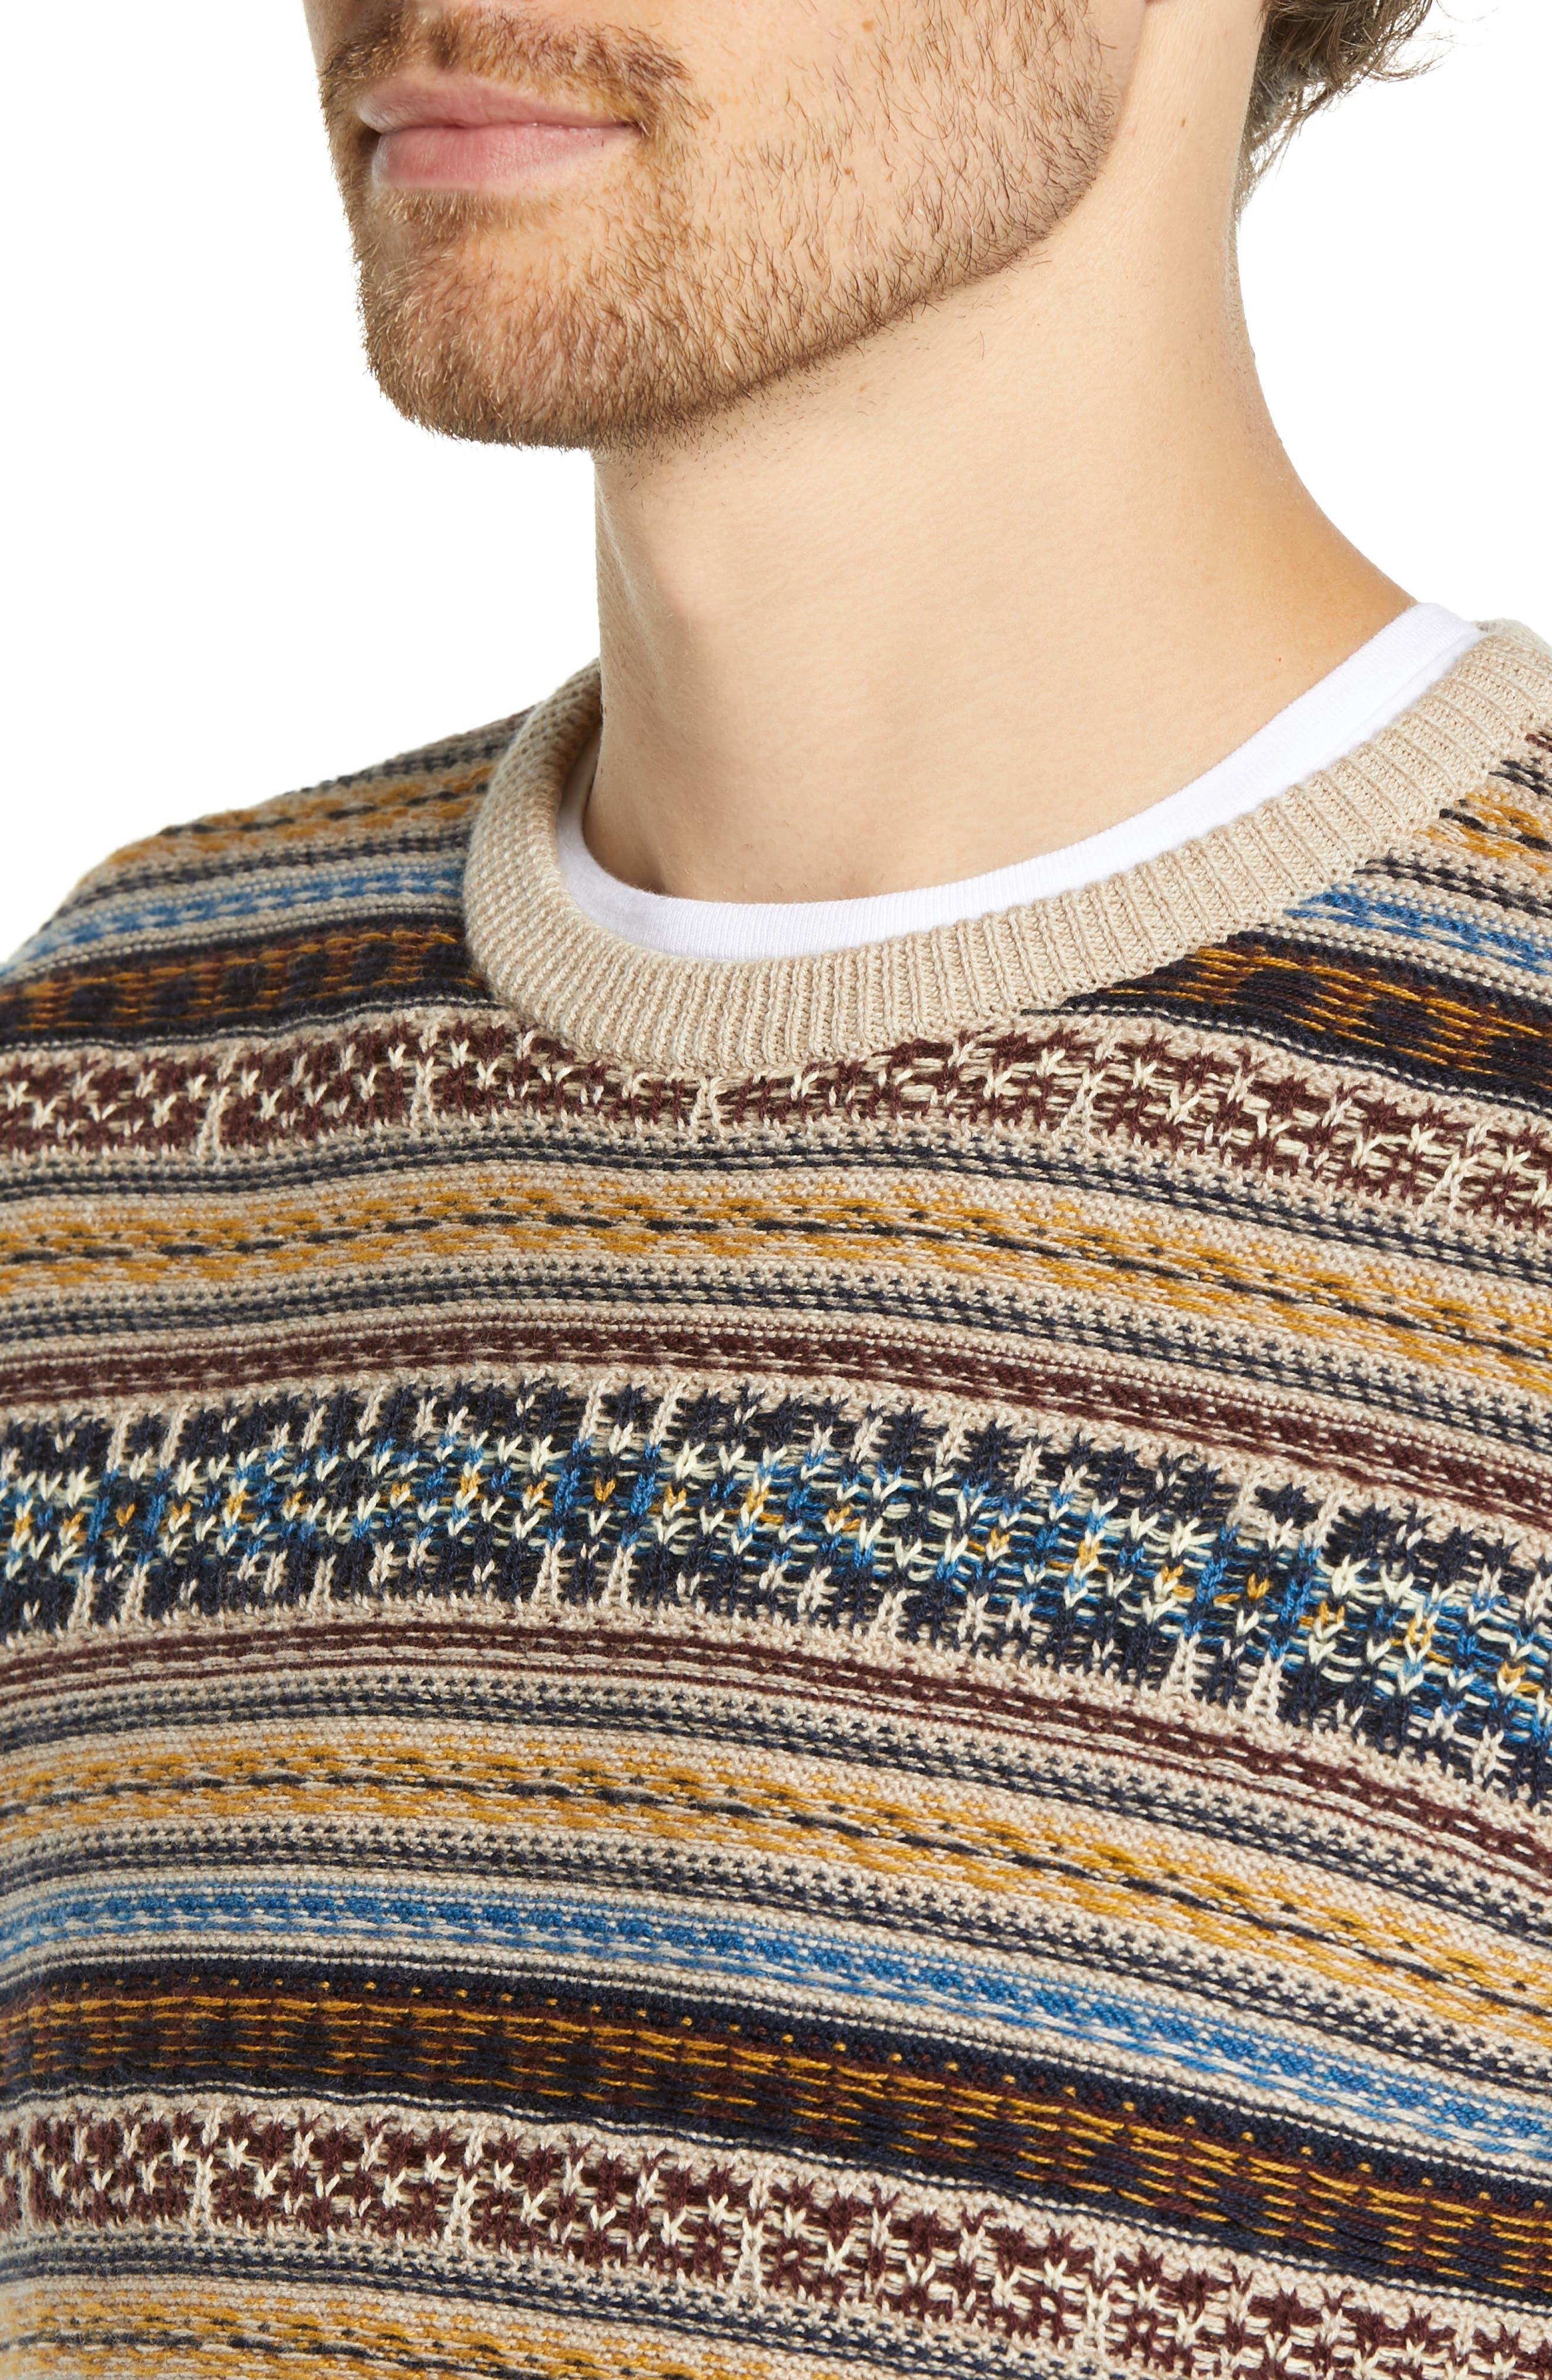 Regular Fit Fair Isle Crewneck Sweater,                             Alternate thumbnail 4, color,                             BROWN SIENA FAIRISLE